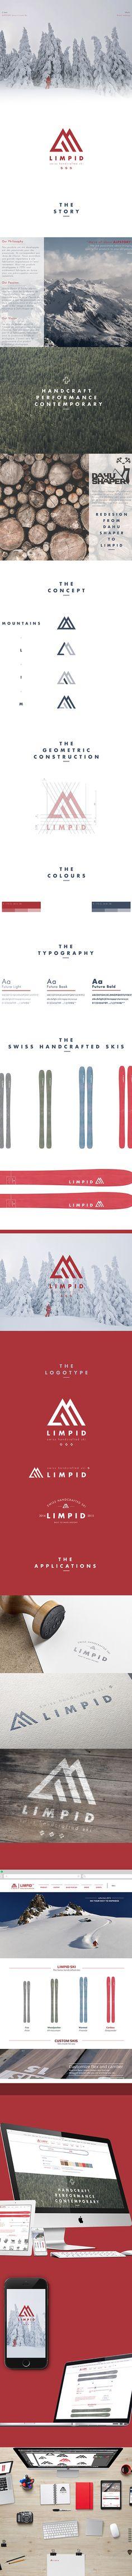 LIMPID Skis on Adweek Talent Gallery